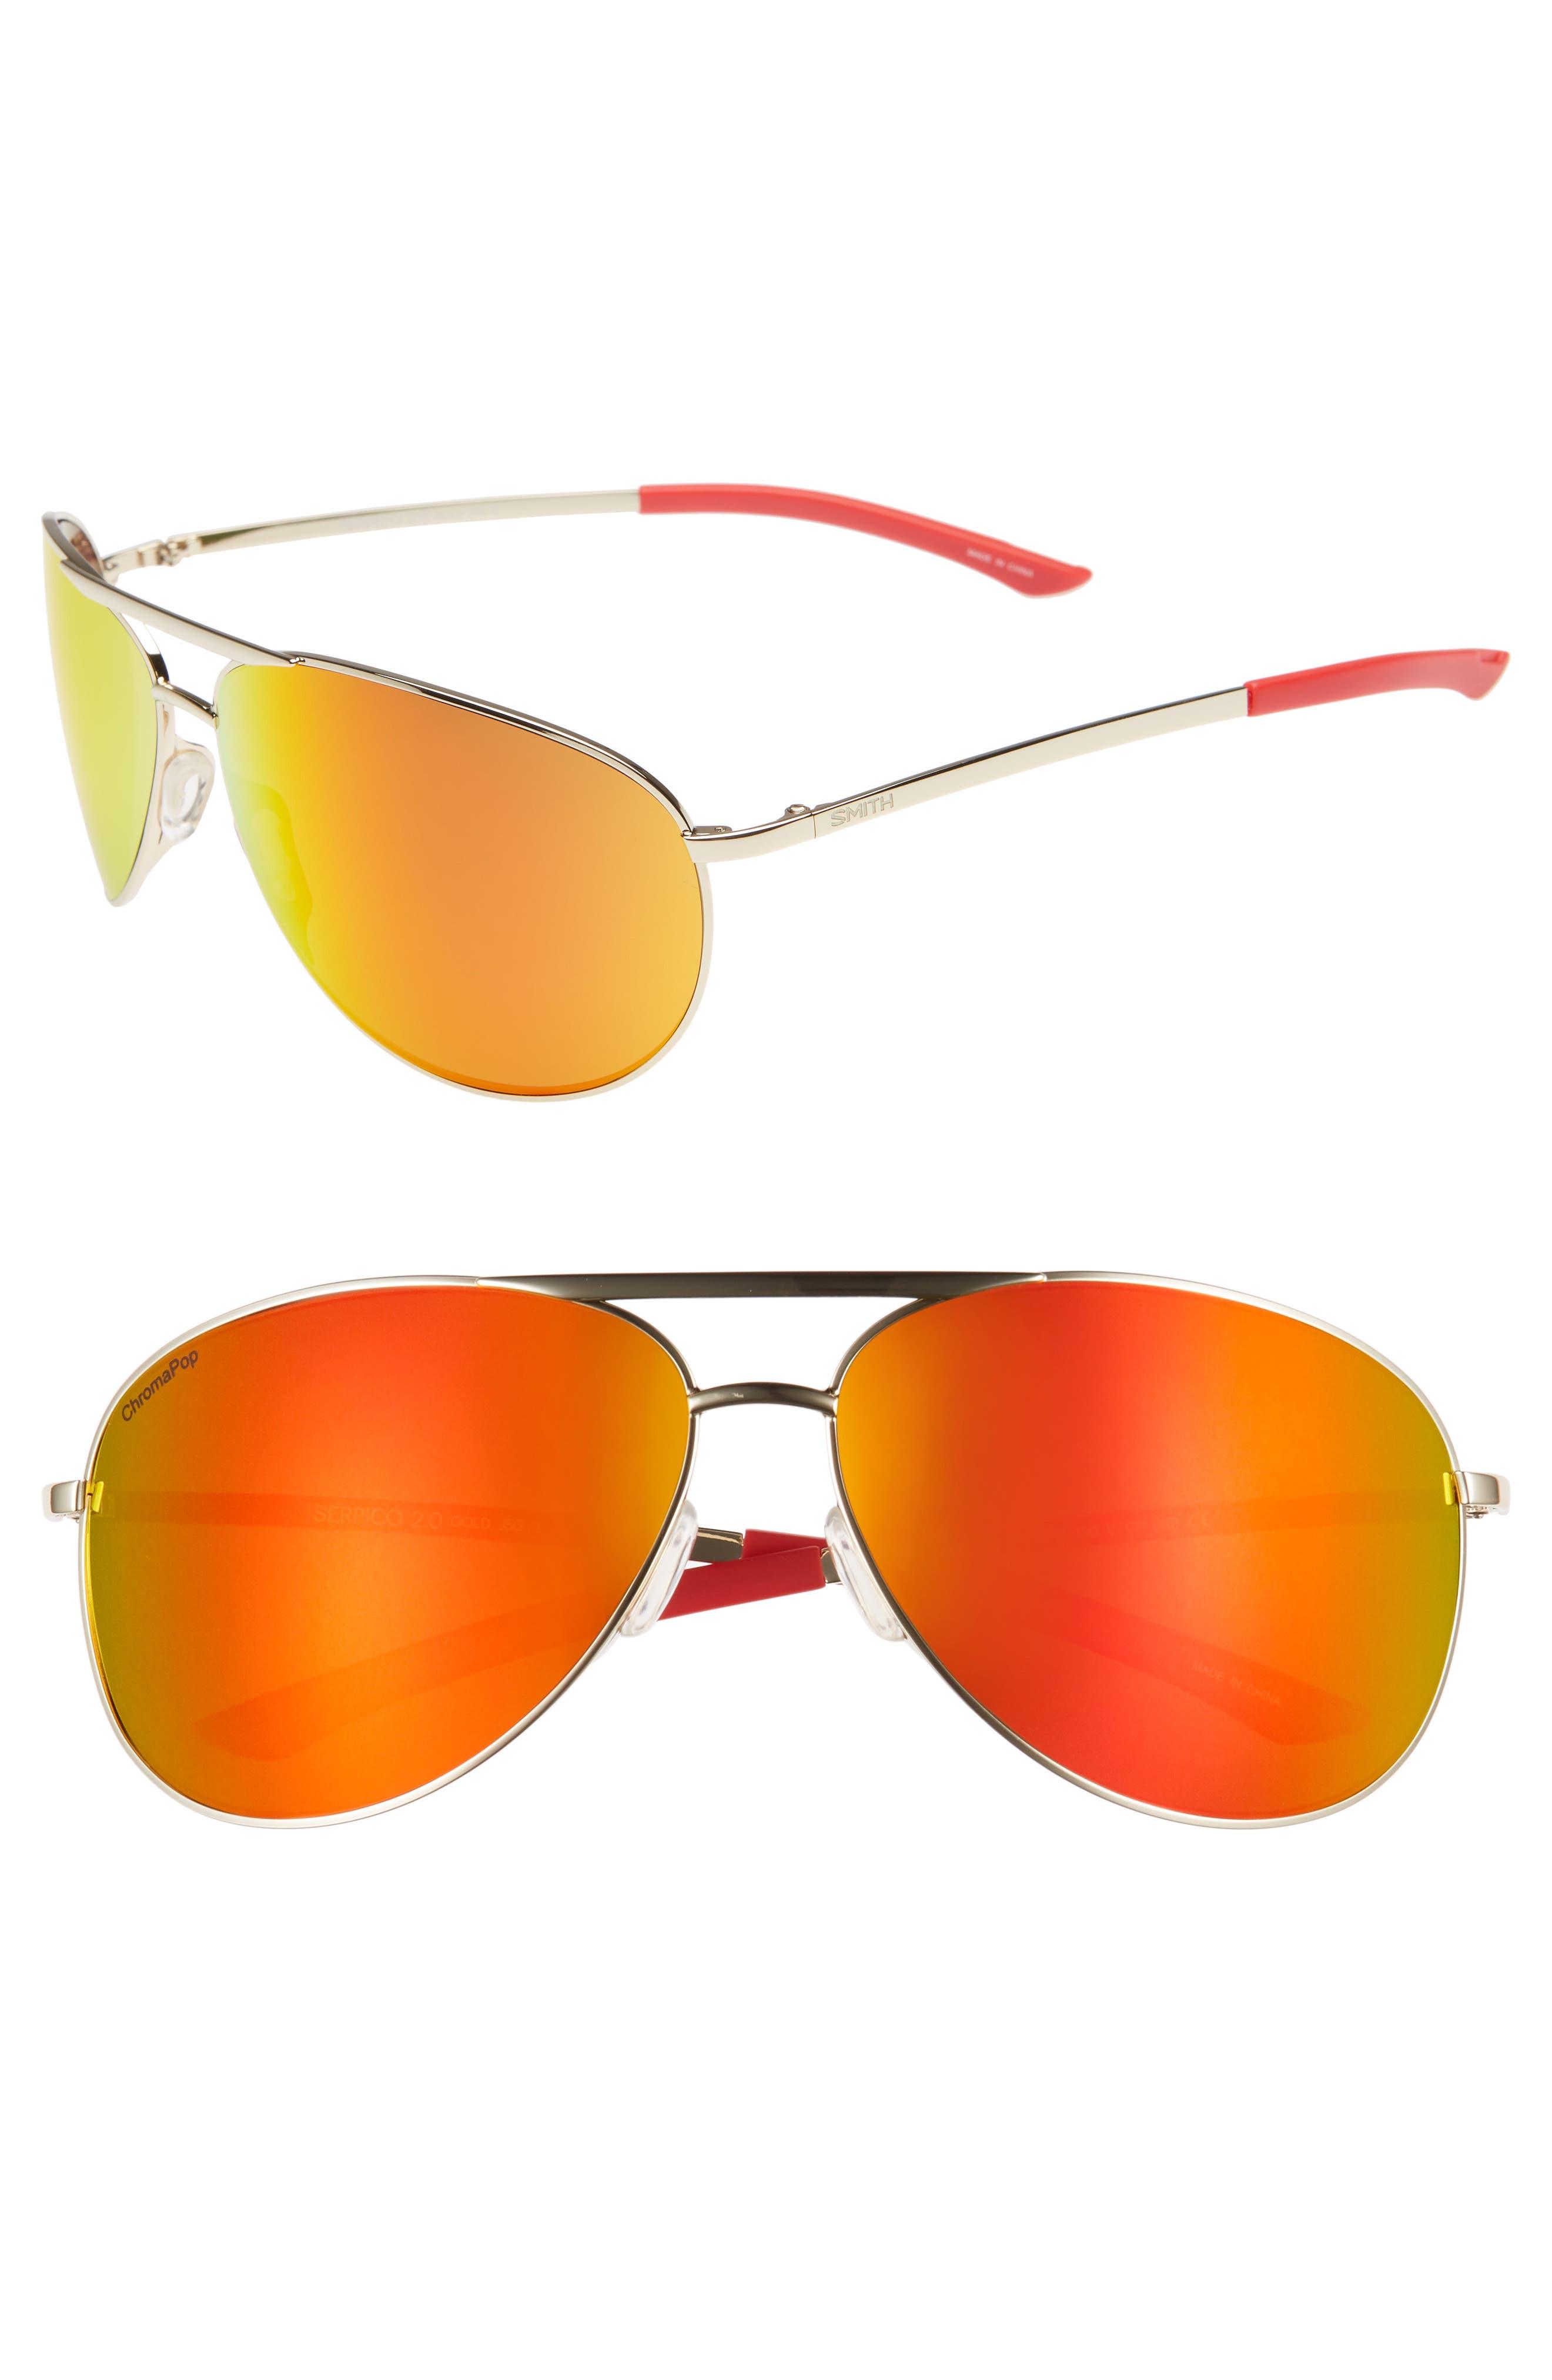 Serpico 2 65mm Mirrored ChromaPop<sup>™</sup> Aviator Sunglasses,                         Main,                         color, GOLD/ RED